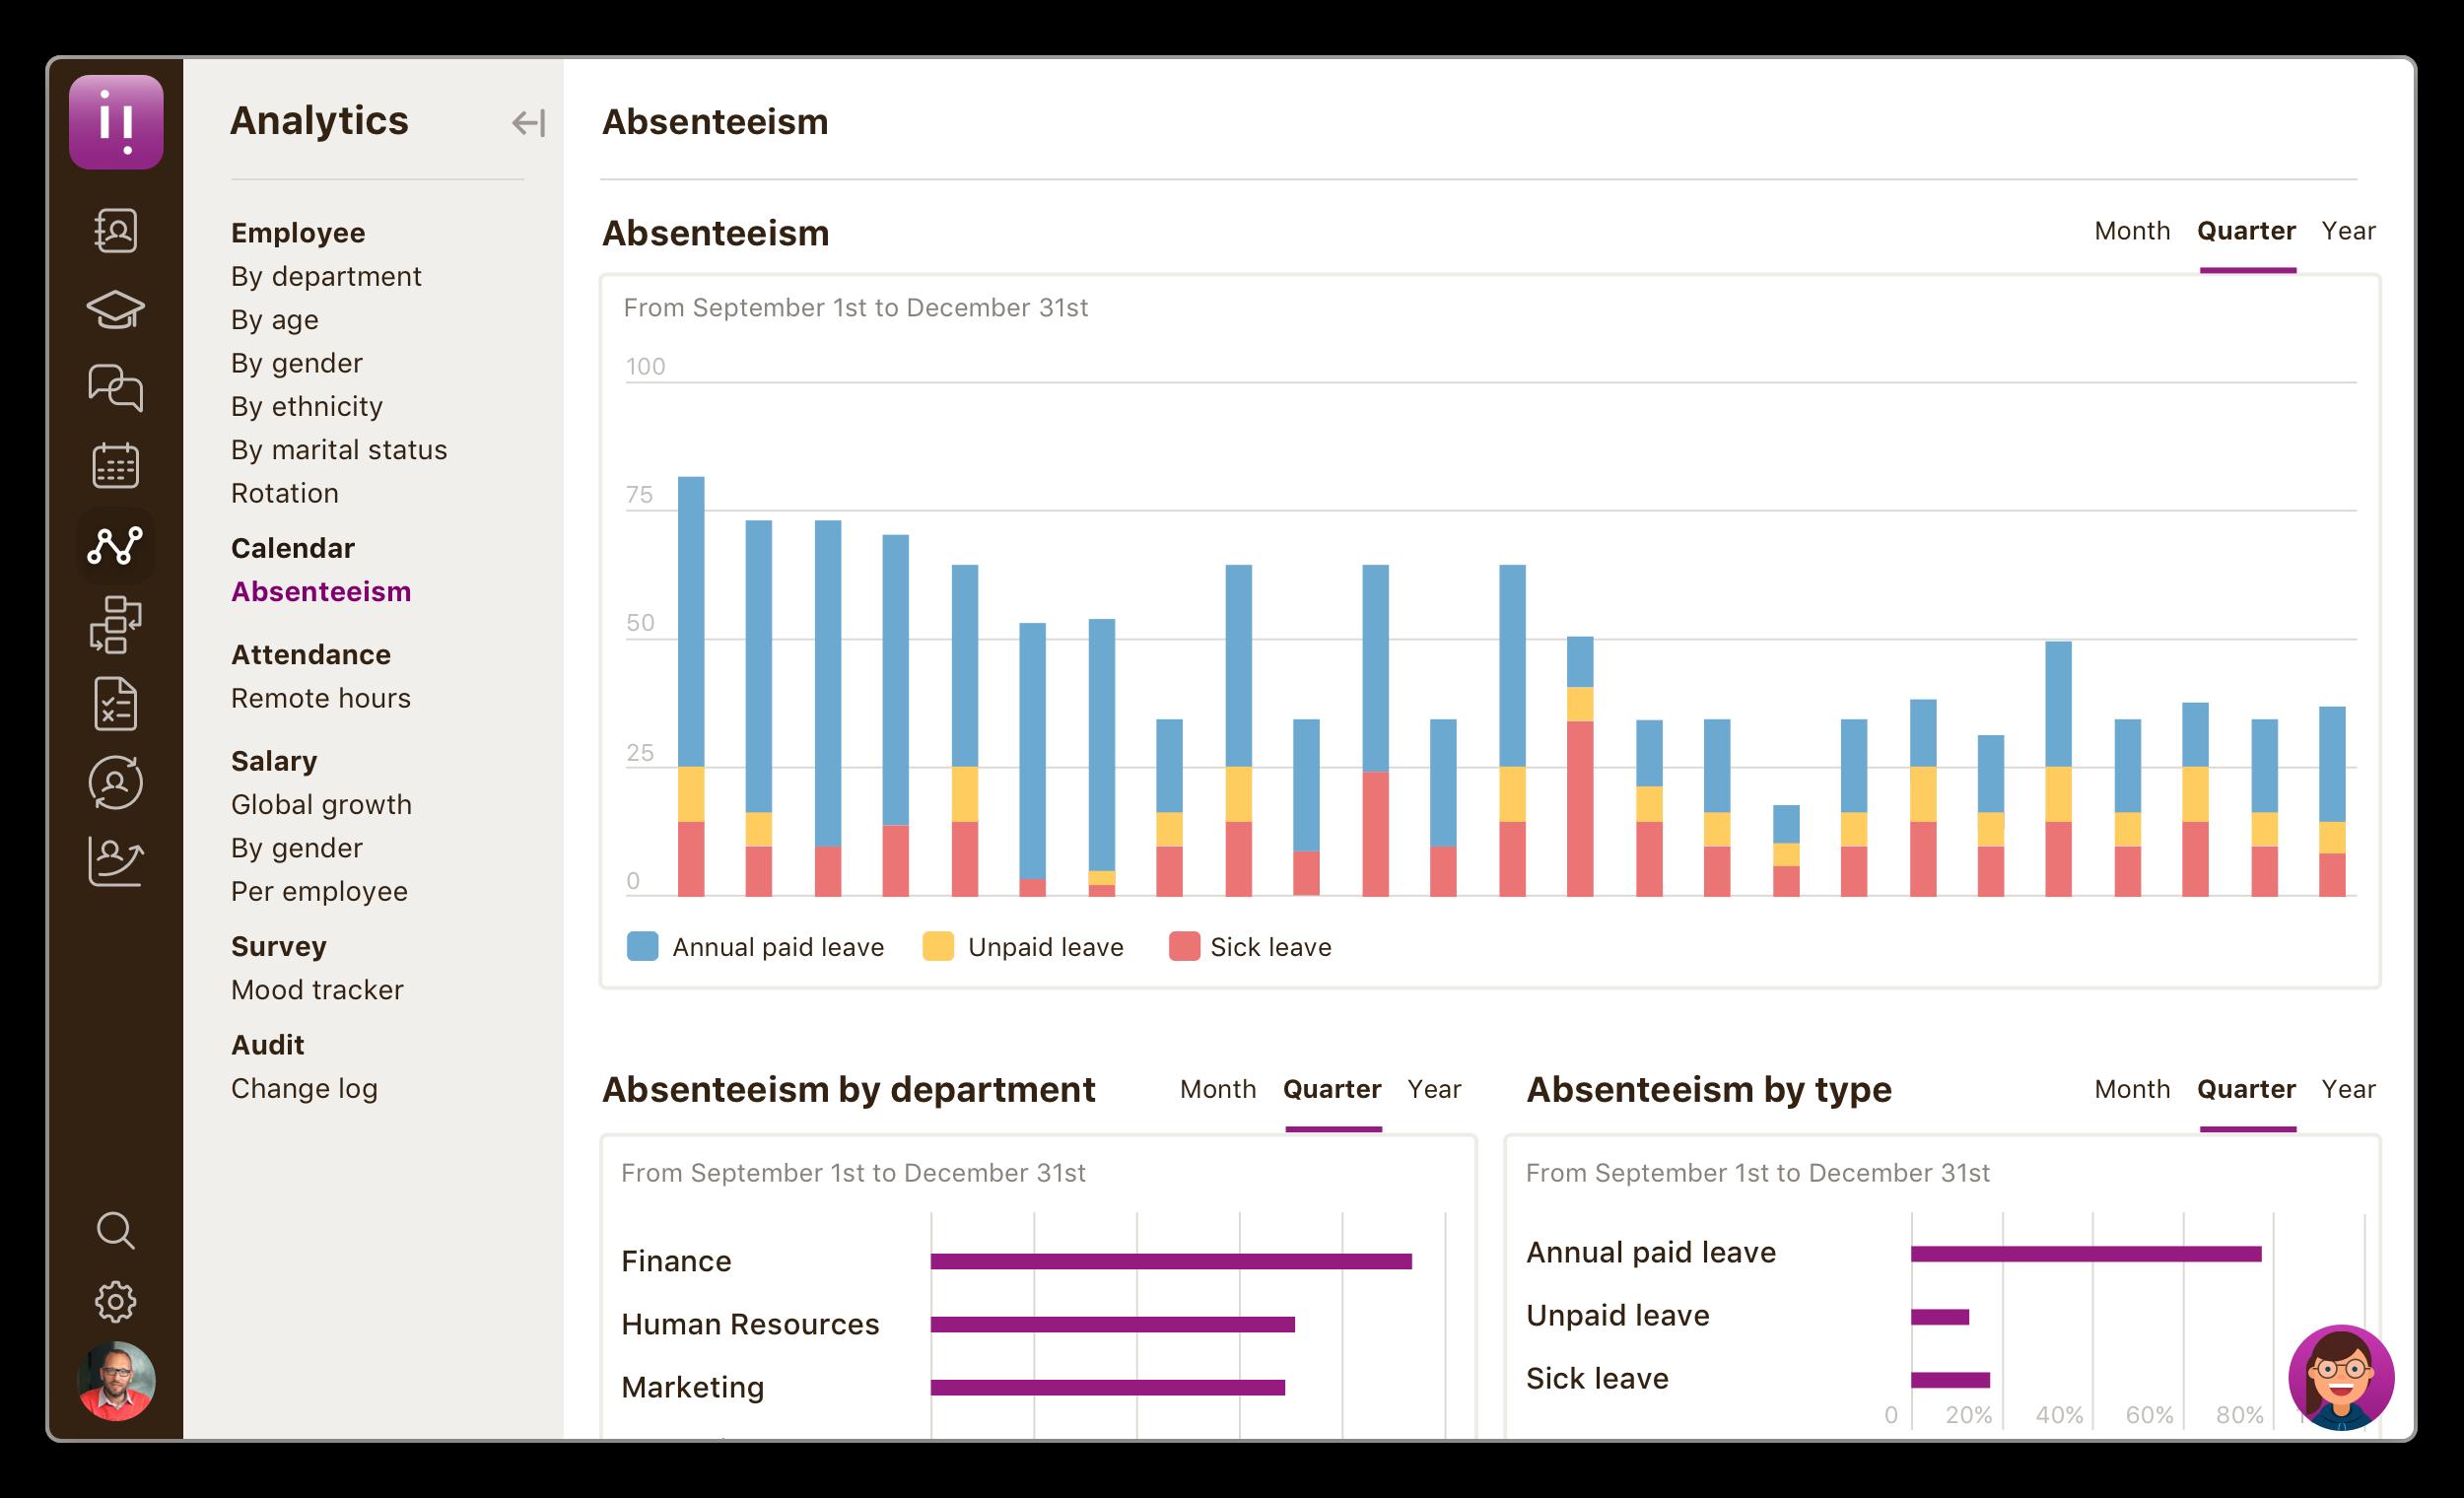 Niikiis Software - Analytics - Absenteeism